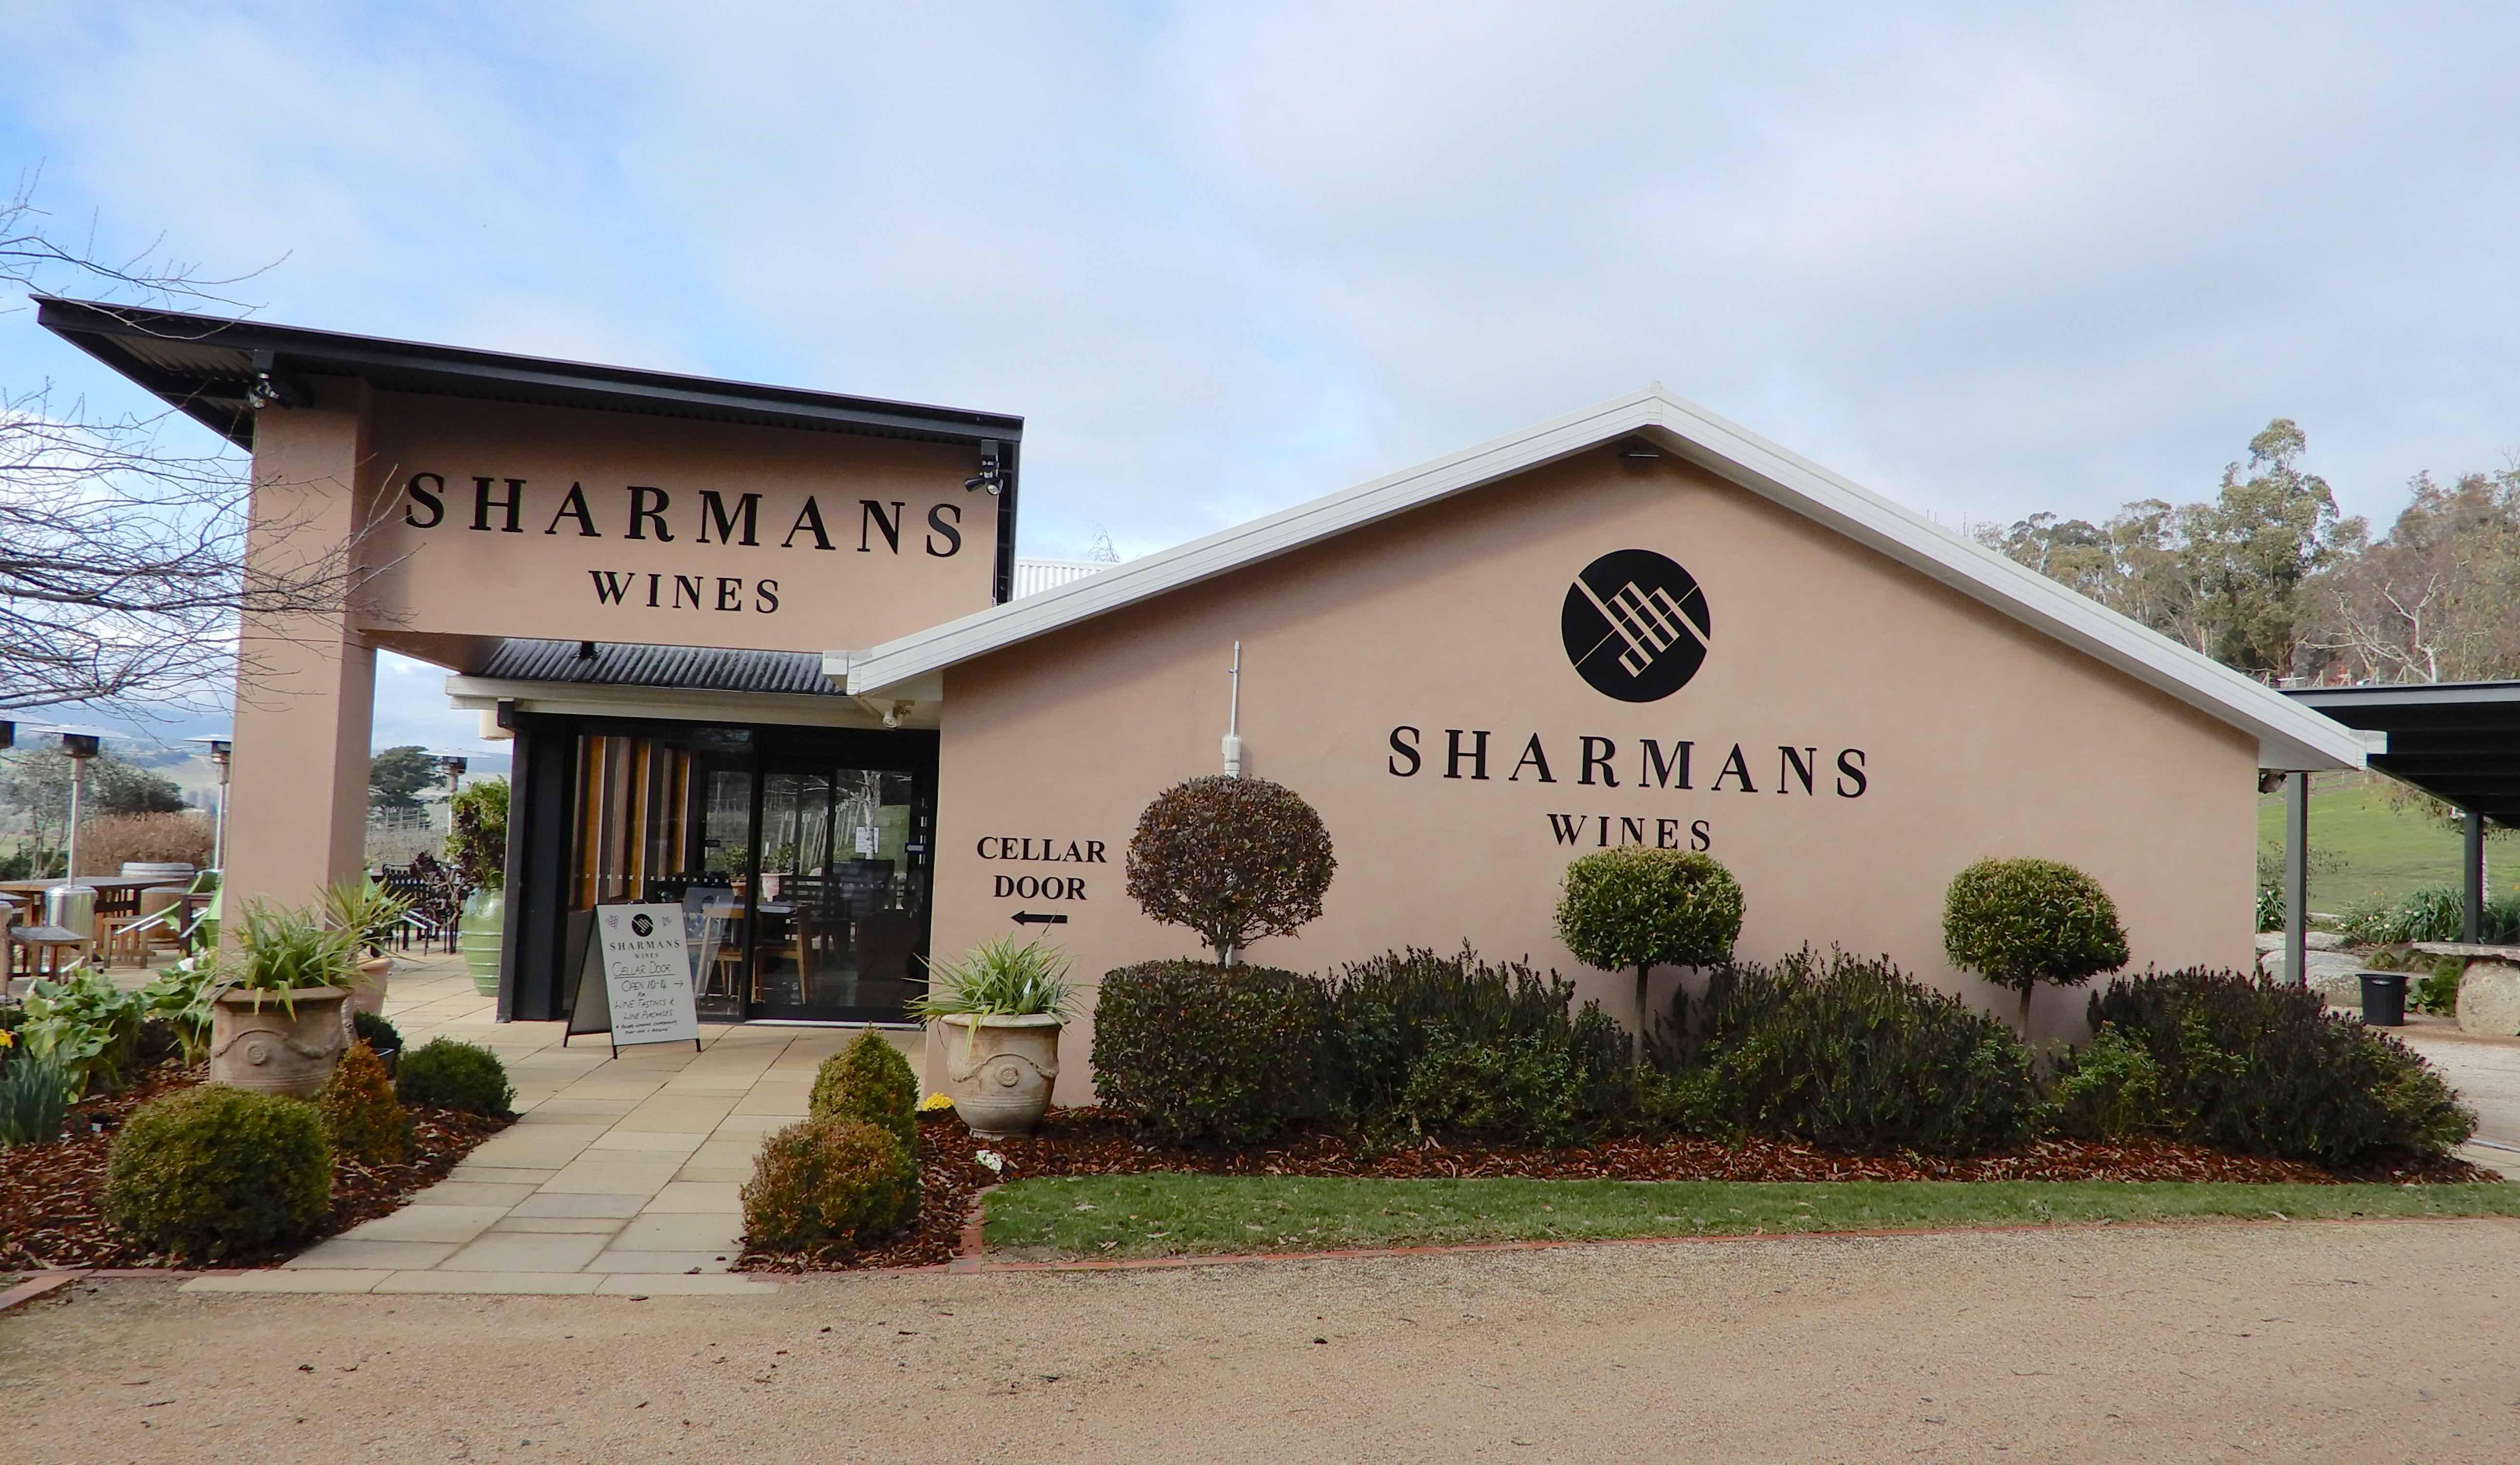 1.Sharmans Wines